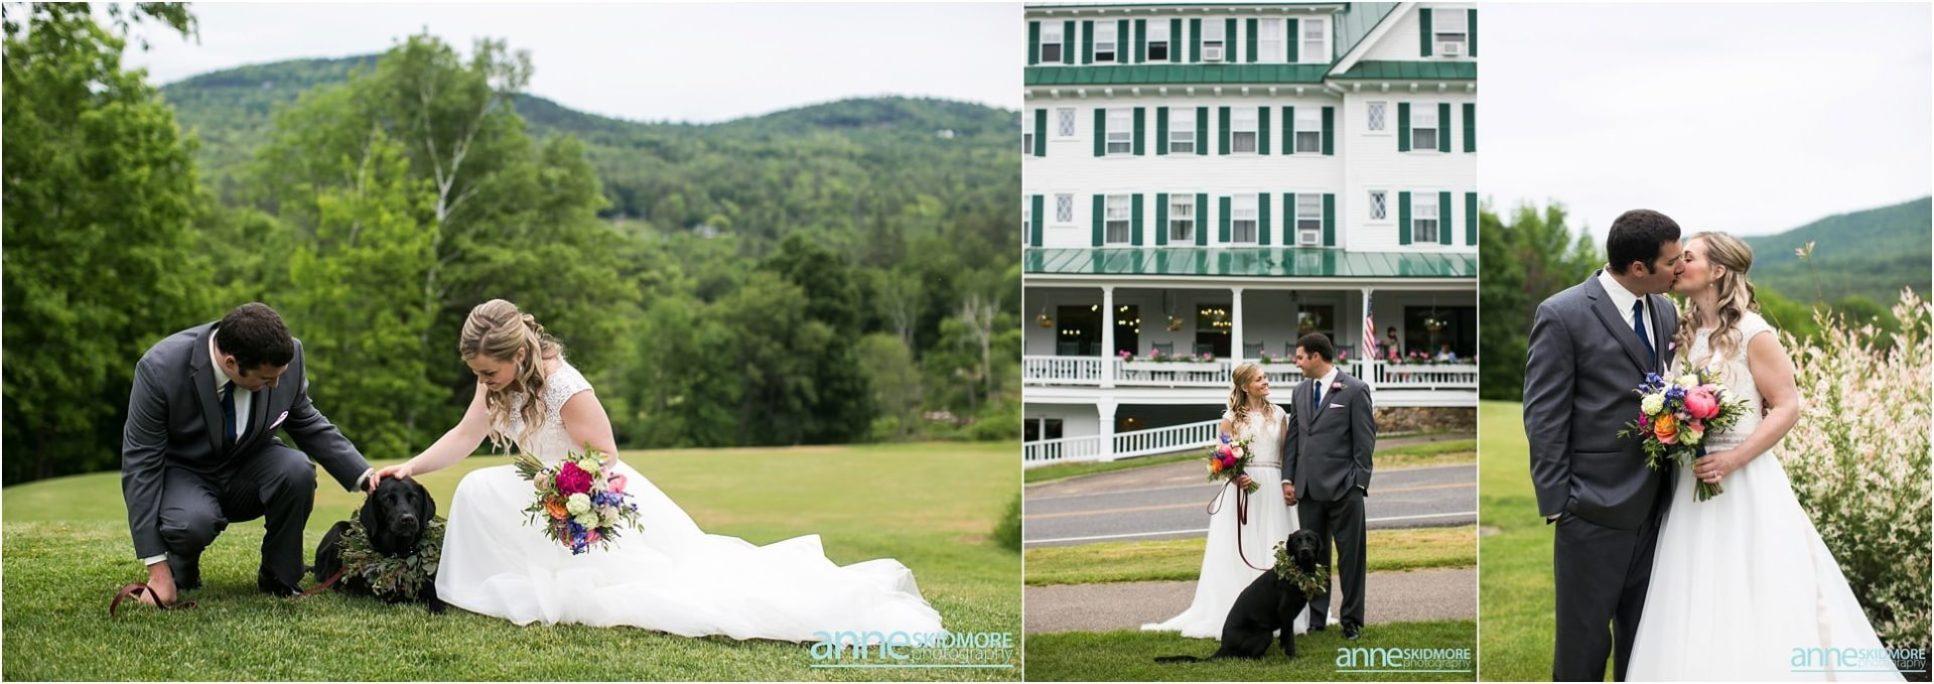 Eagle_Mountain_House_Wedding__033